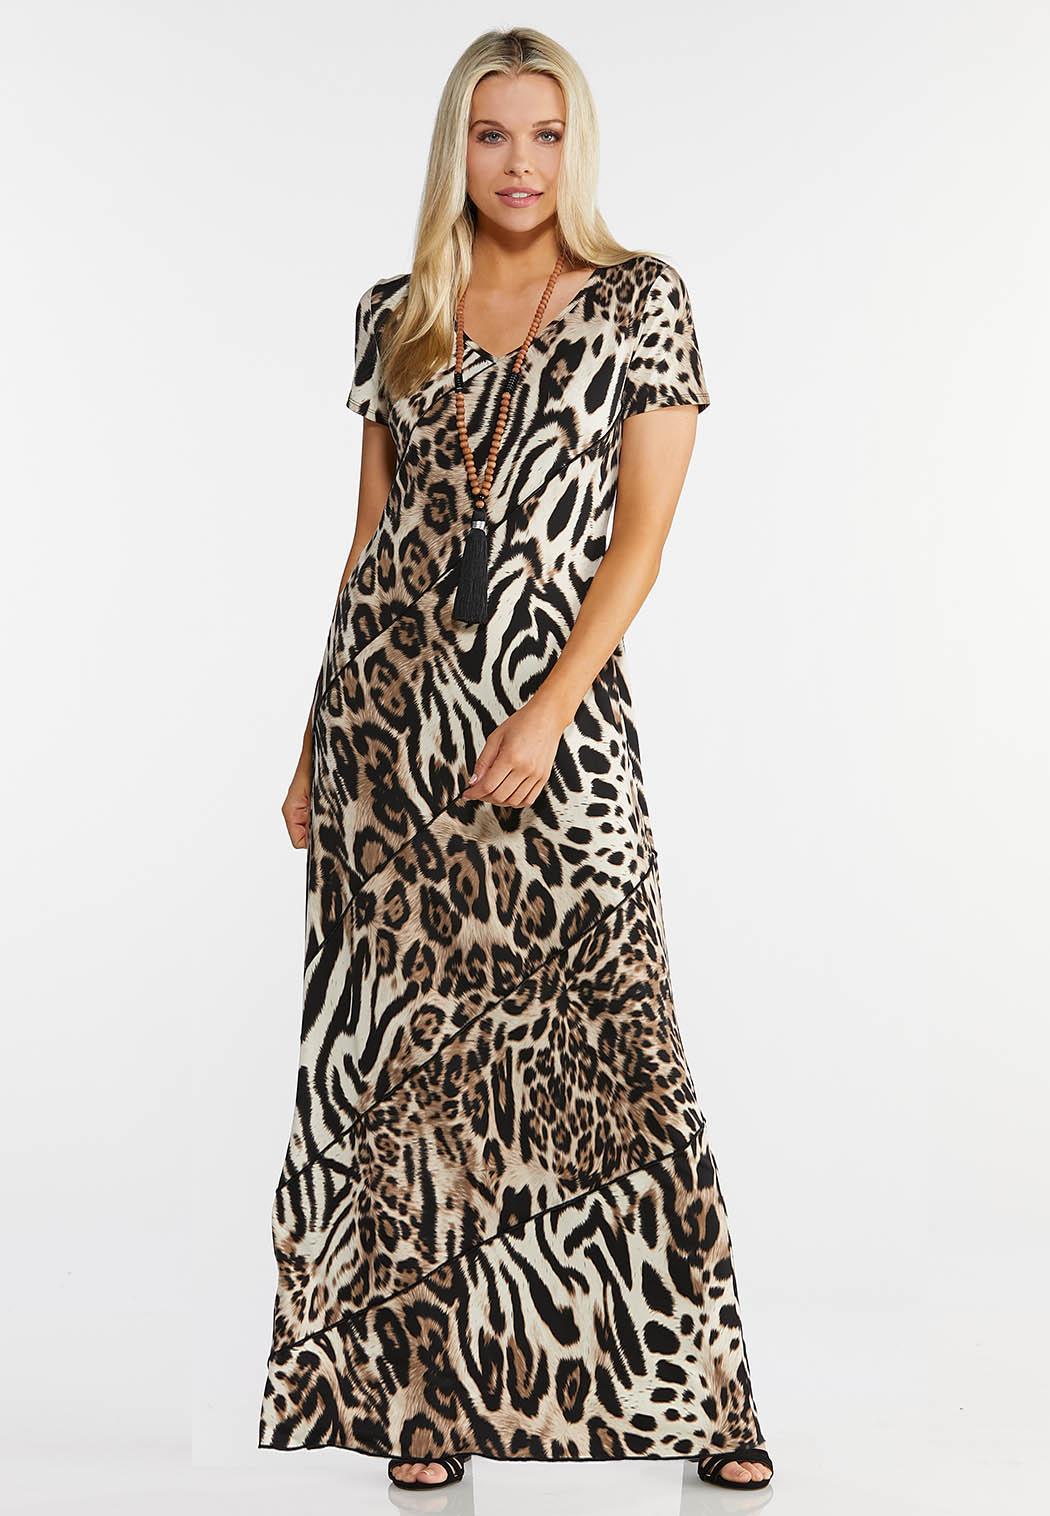 92e1f1cb89d5 Plus Size Dresses For Women - Swing, Maxi, Midi & More